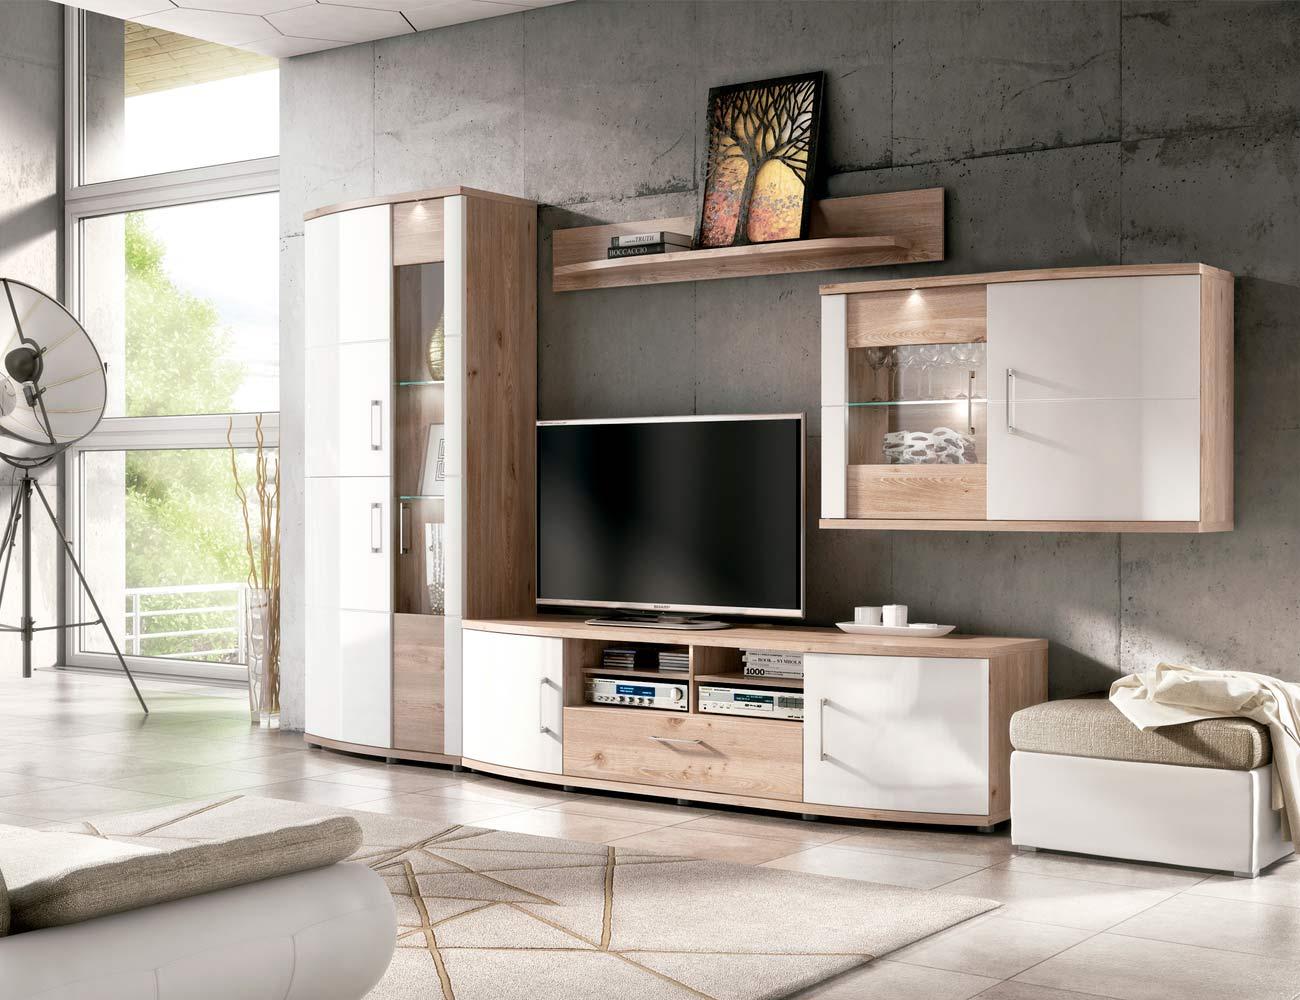 Ambiente8 mueble salon comedor vitrina bodeguero bajo tv alto vitrina  nelson blanco